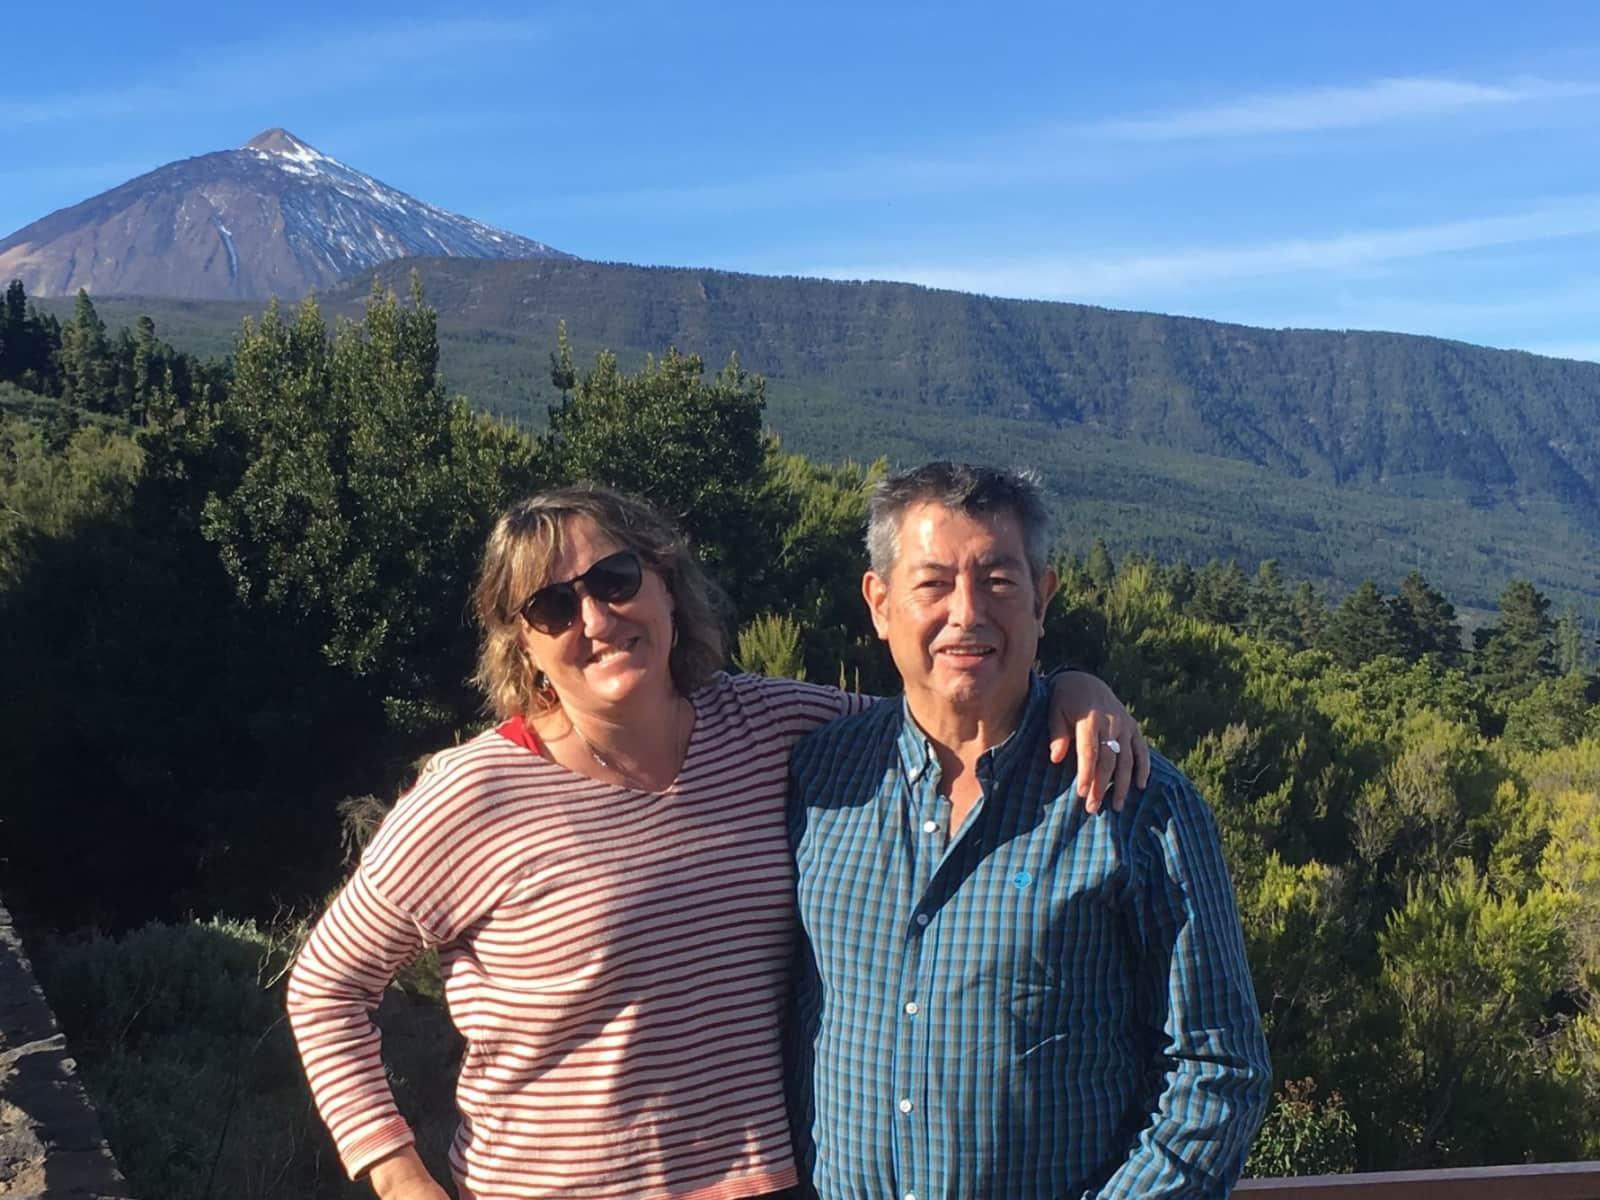 Ana & Eduardo from Pamplona, Spain